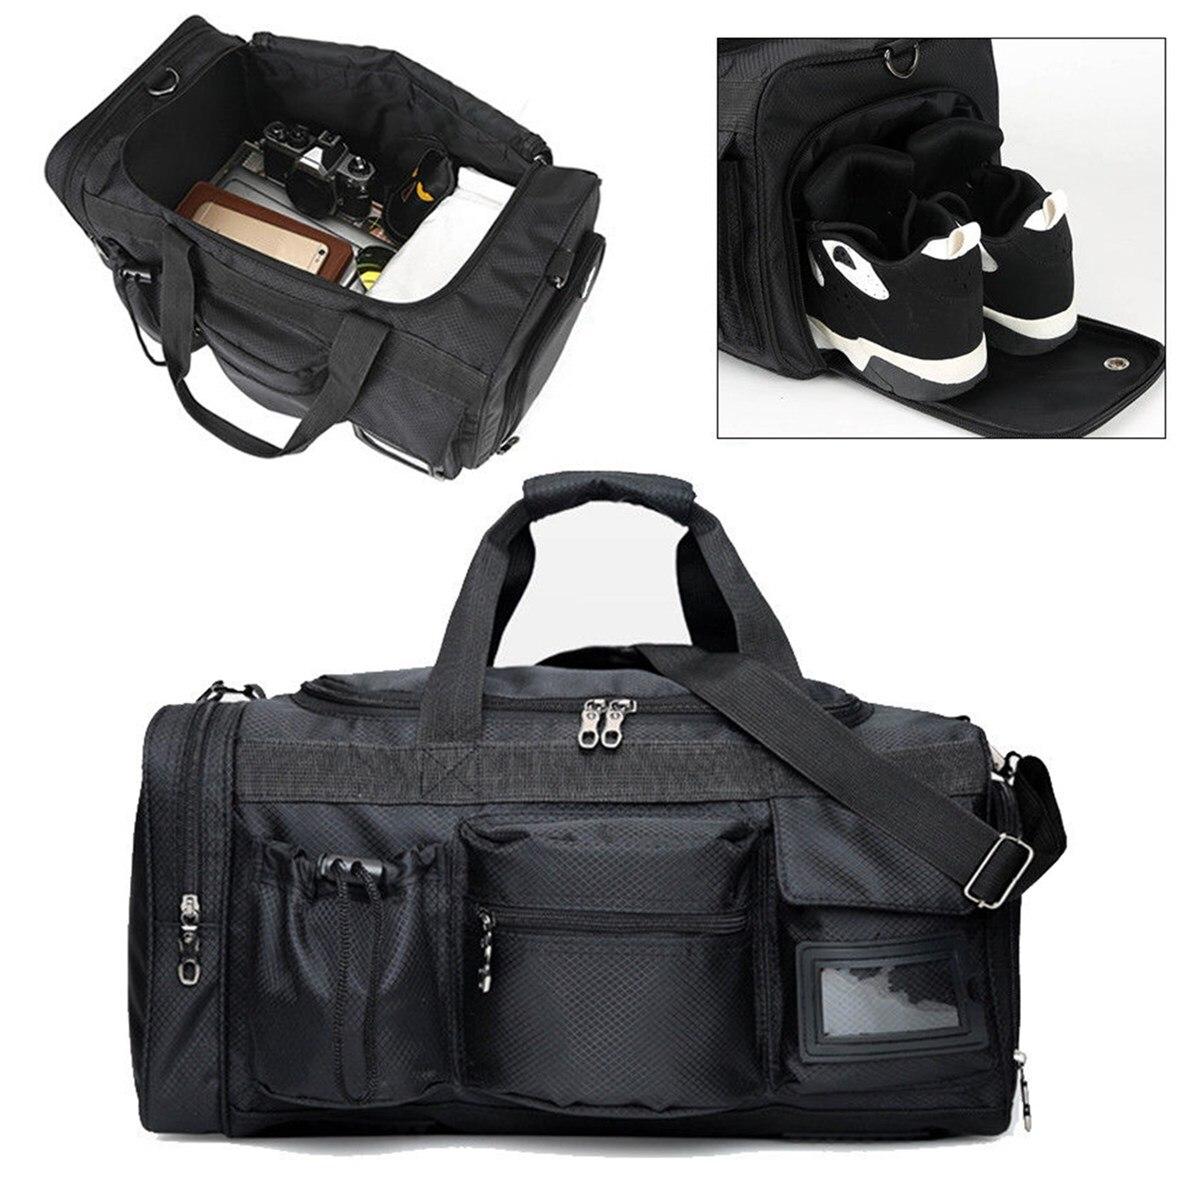 93f3e4c3f0e4 Красивая и удобная спортивная сумка